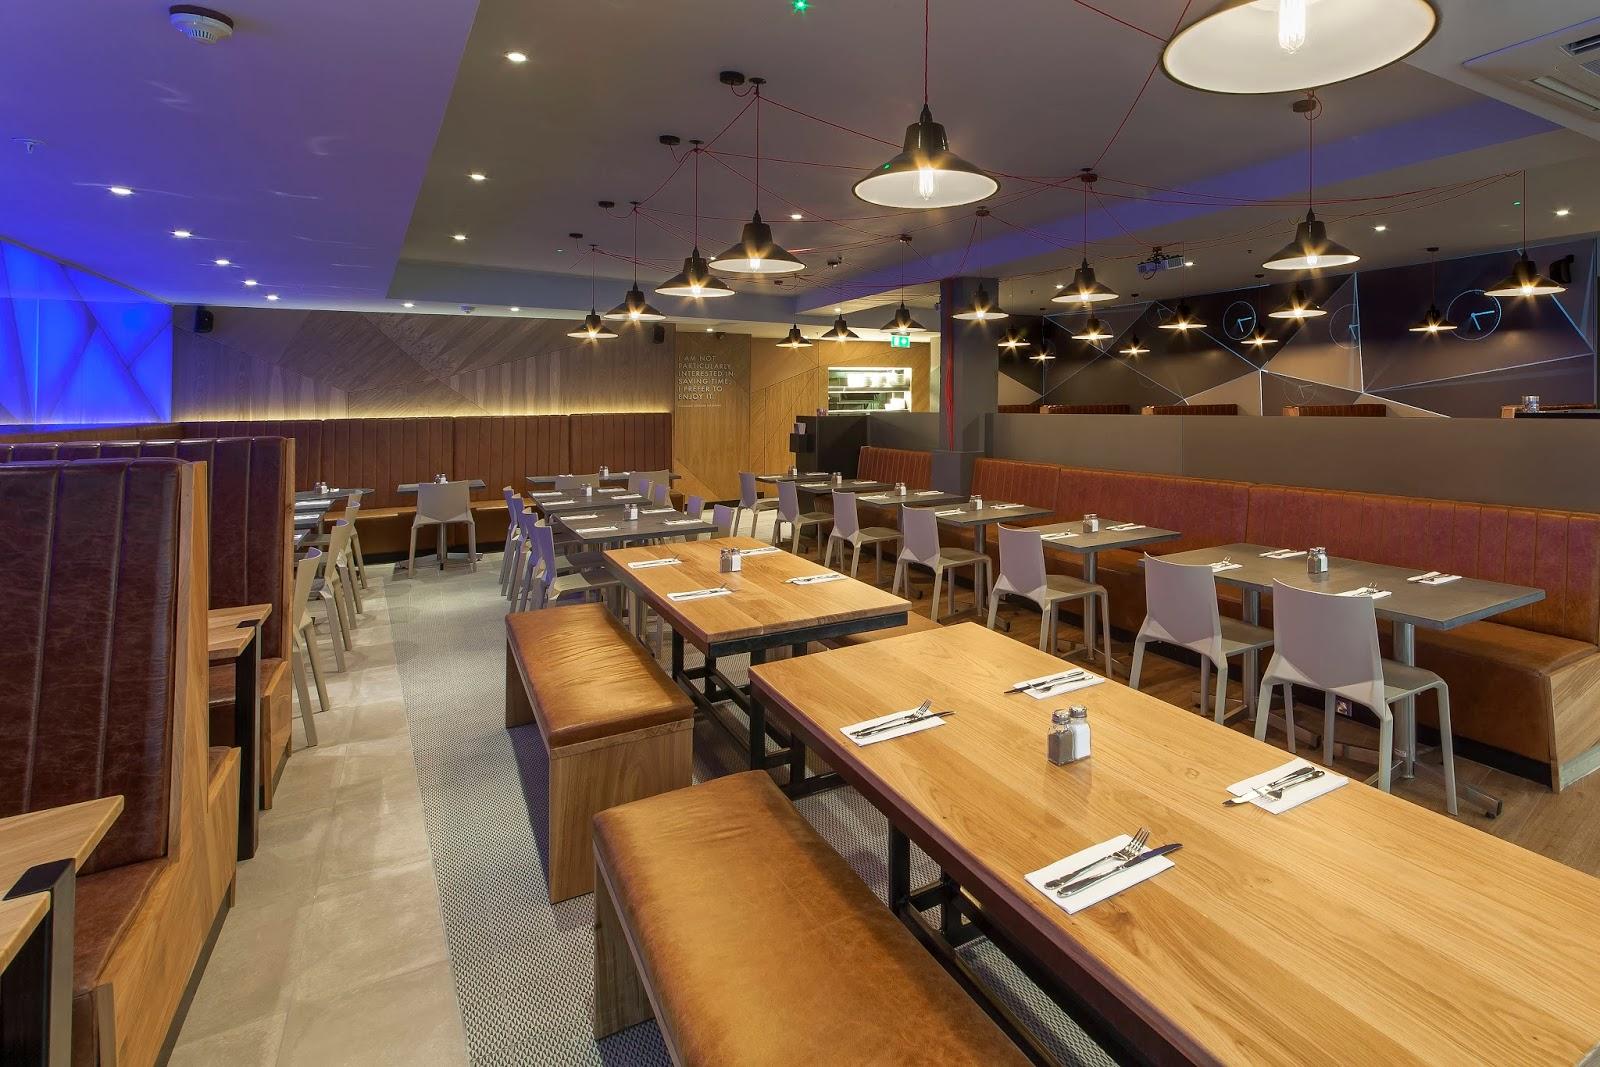 vq-24-hour-restaurant-bloomsbury-london-photo.jpg